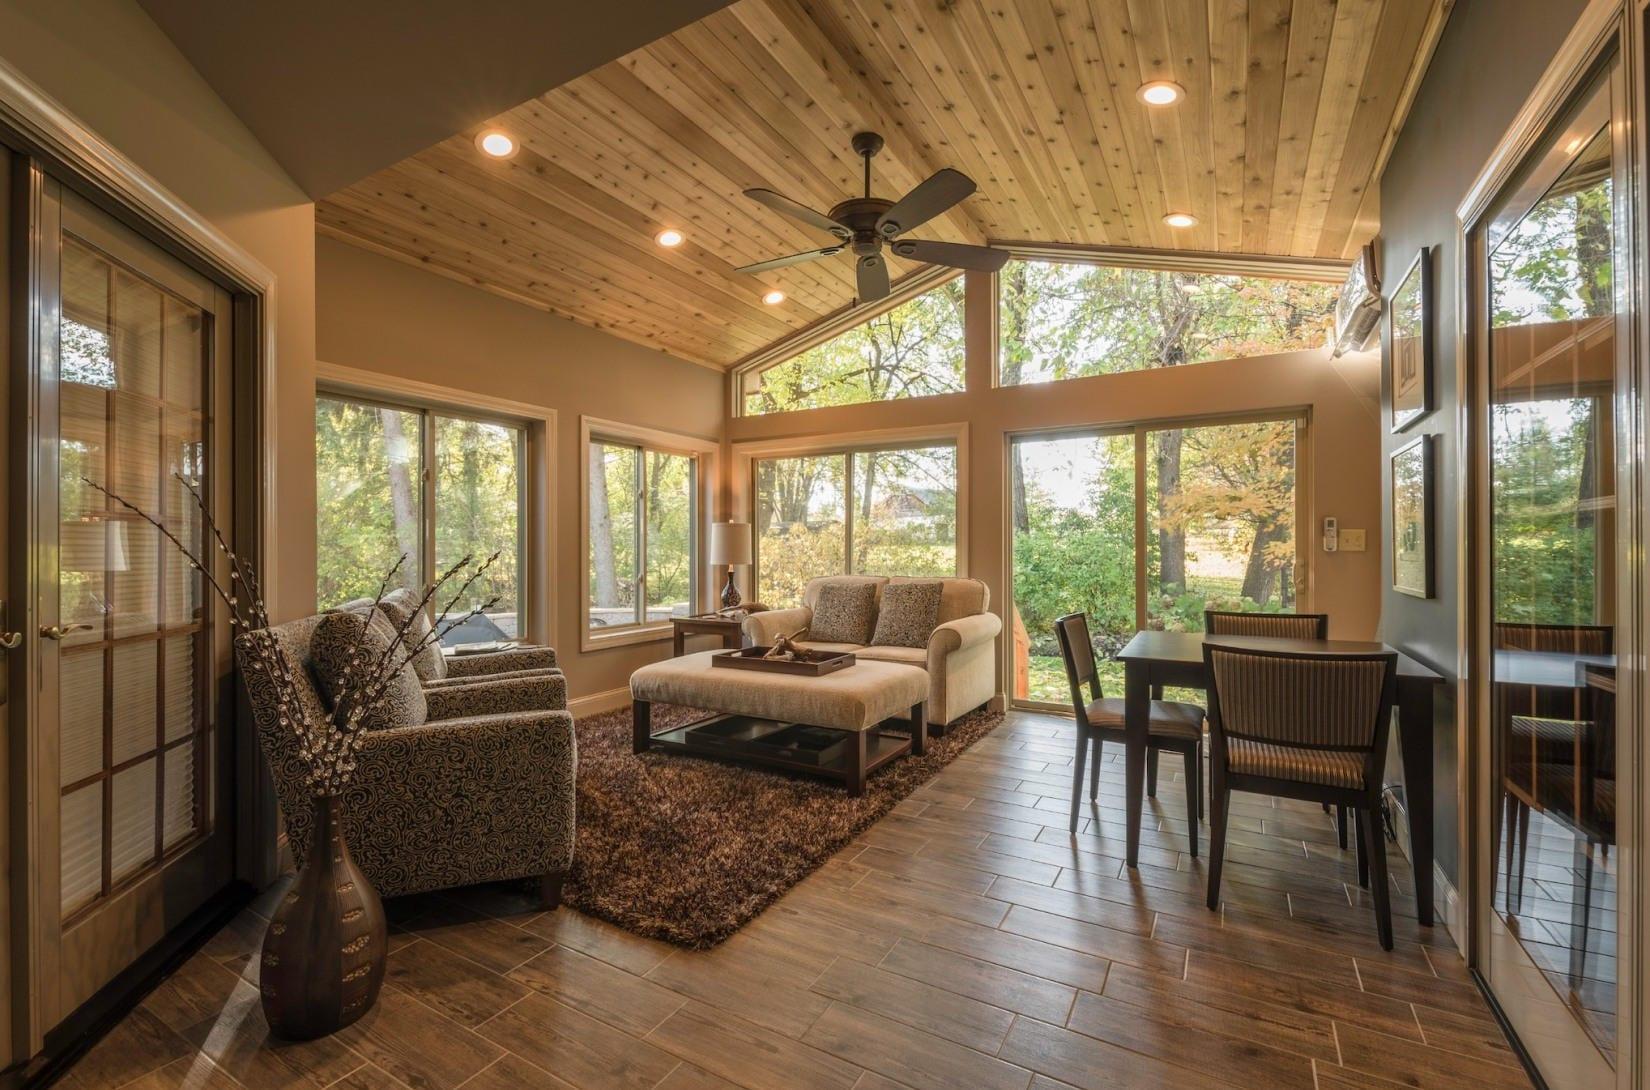 Custom Home Design Consultation | Furnishings Design & Build